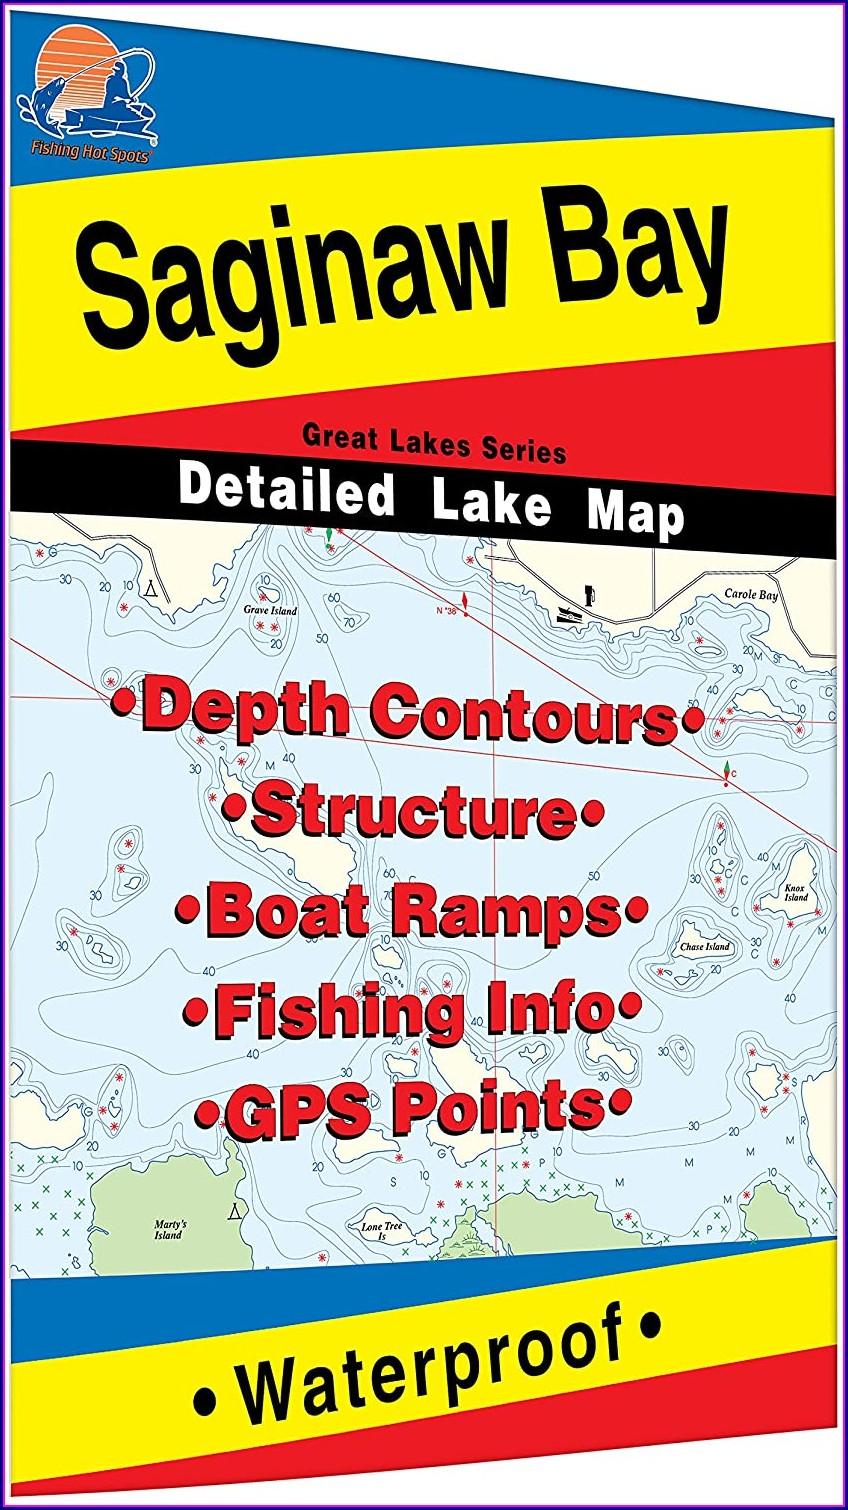 Saginaw Bay Fishing Hot Spots Map